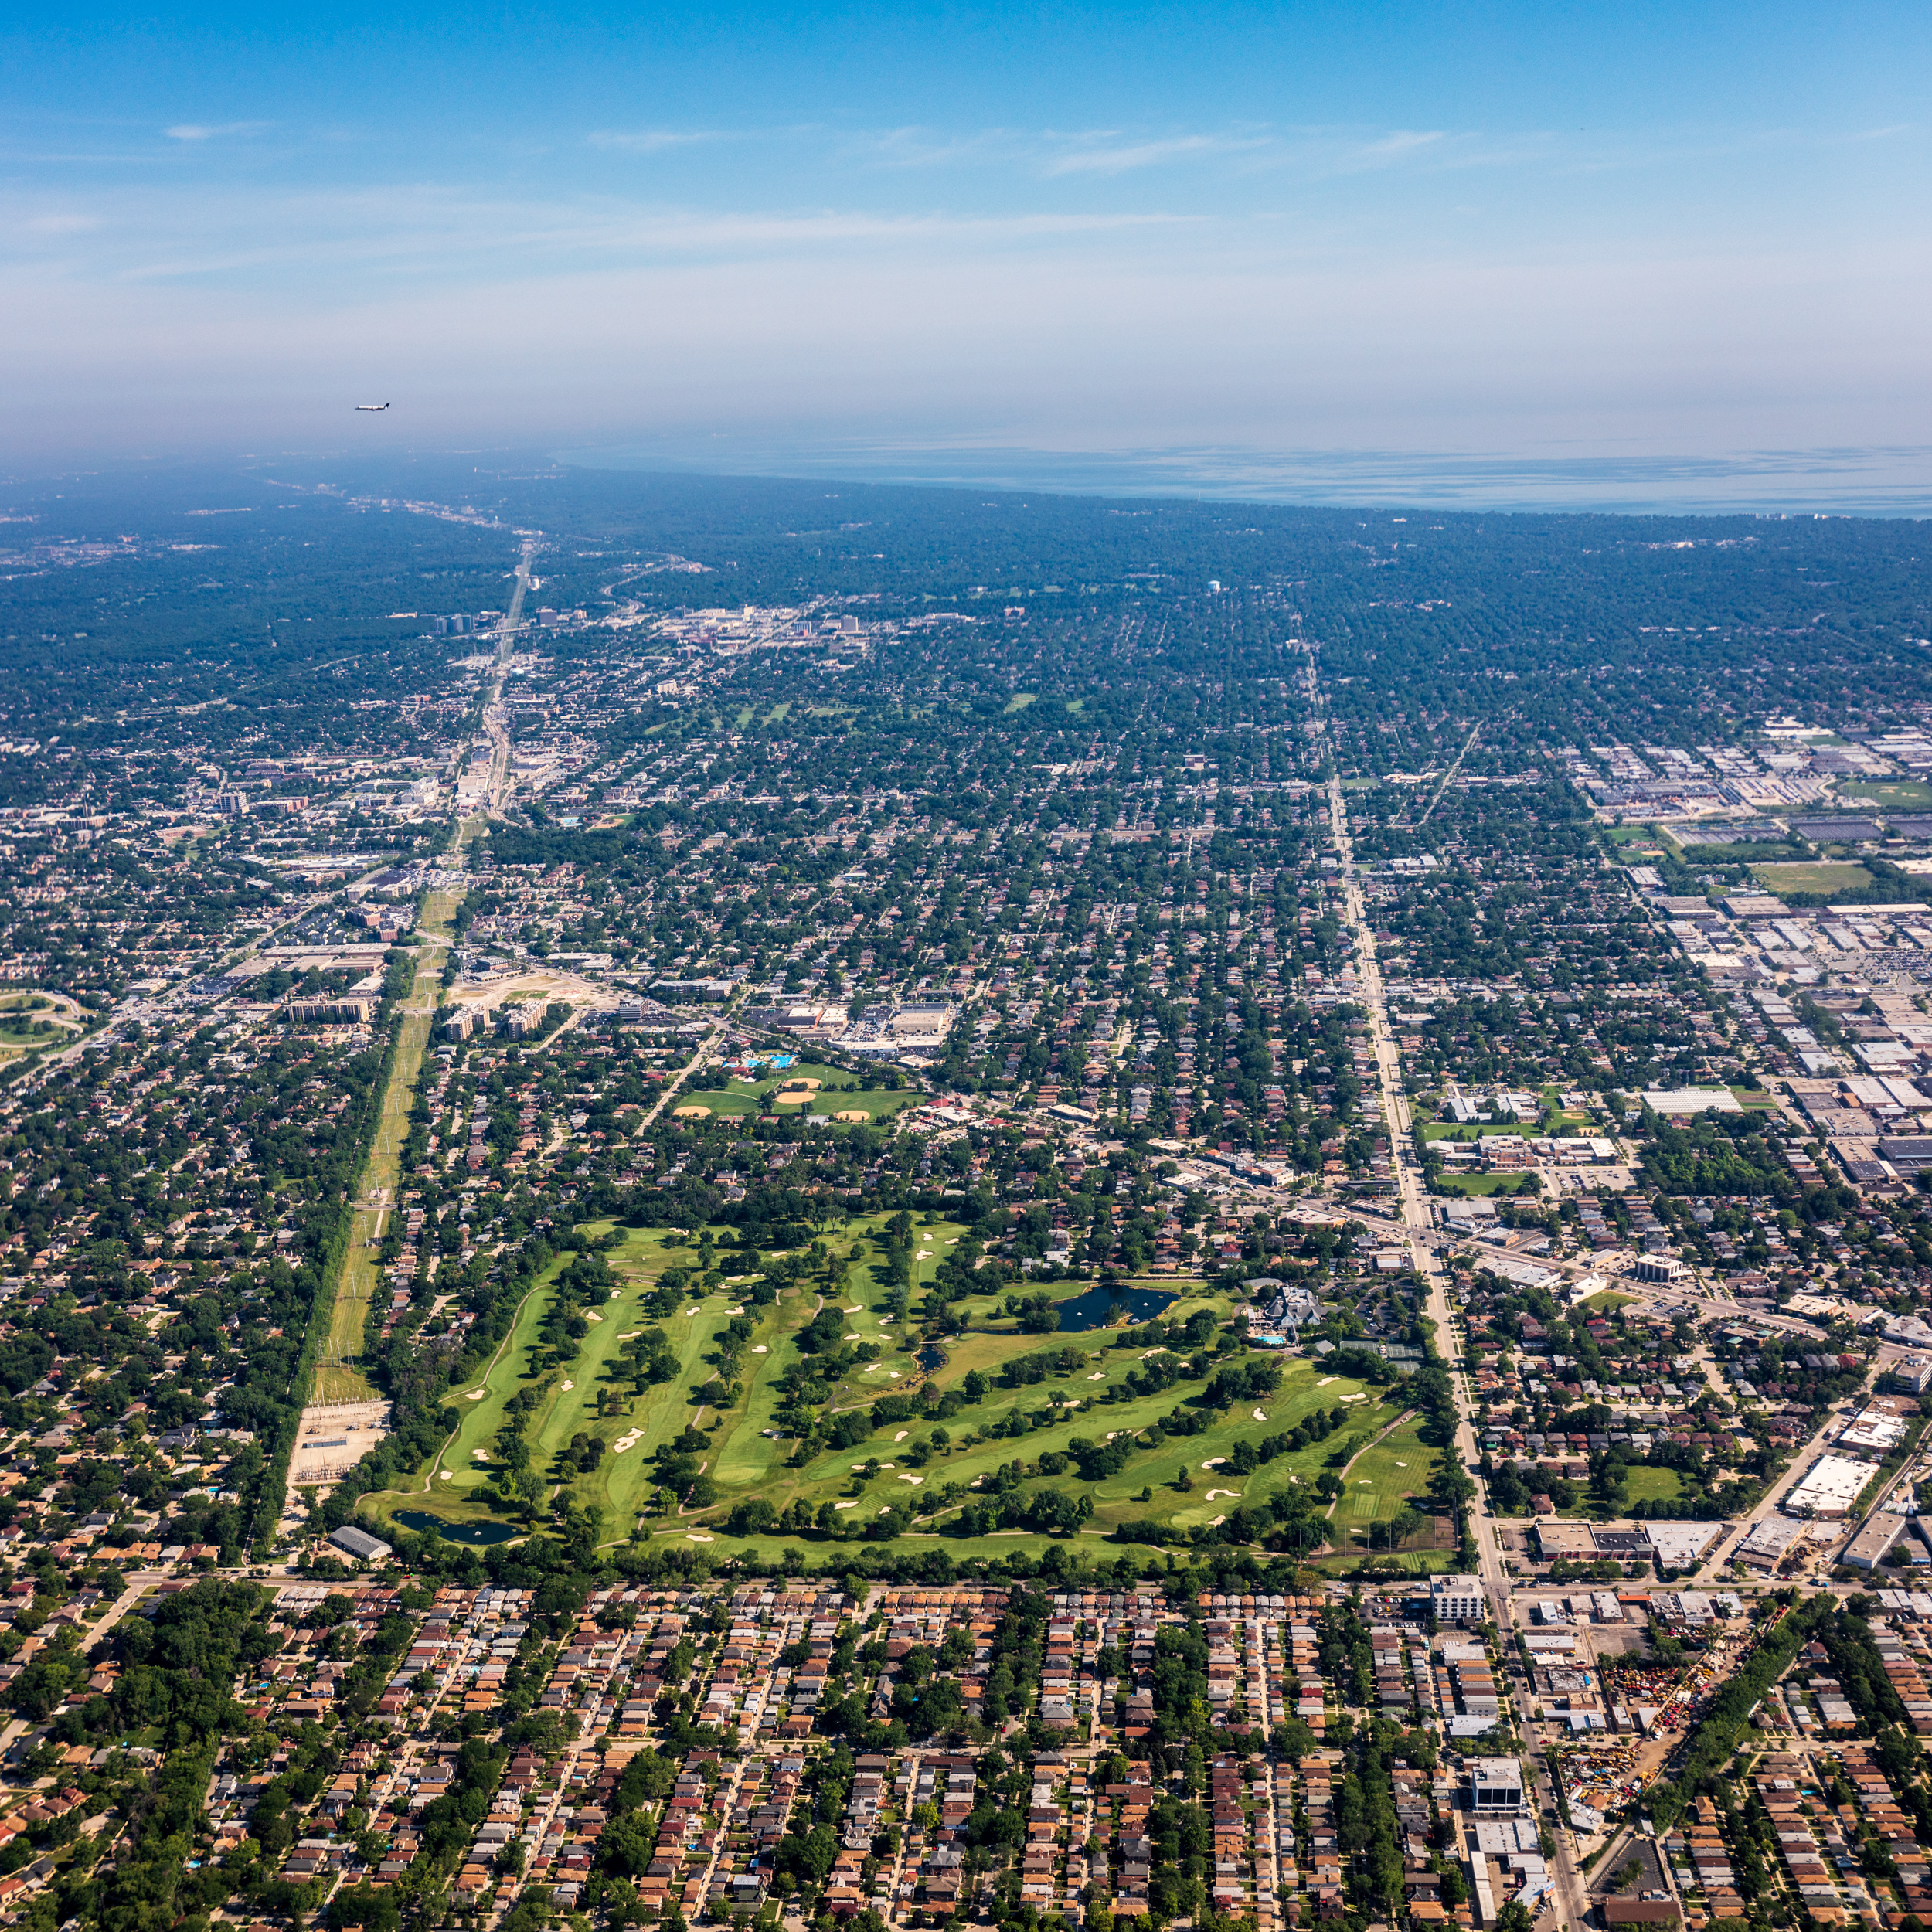 Aerials for Bannon 2019 (2.5k)-7.jpg